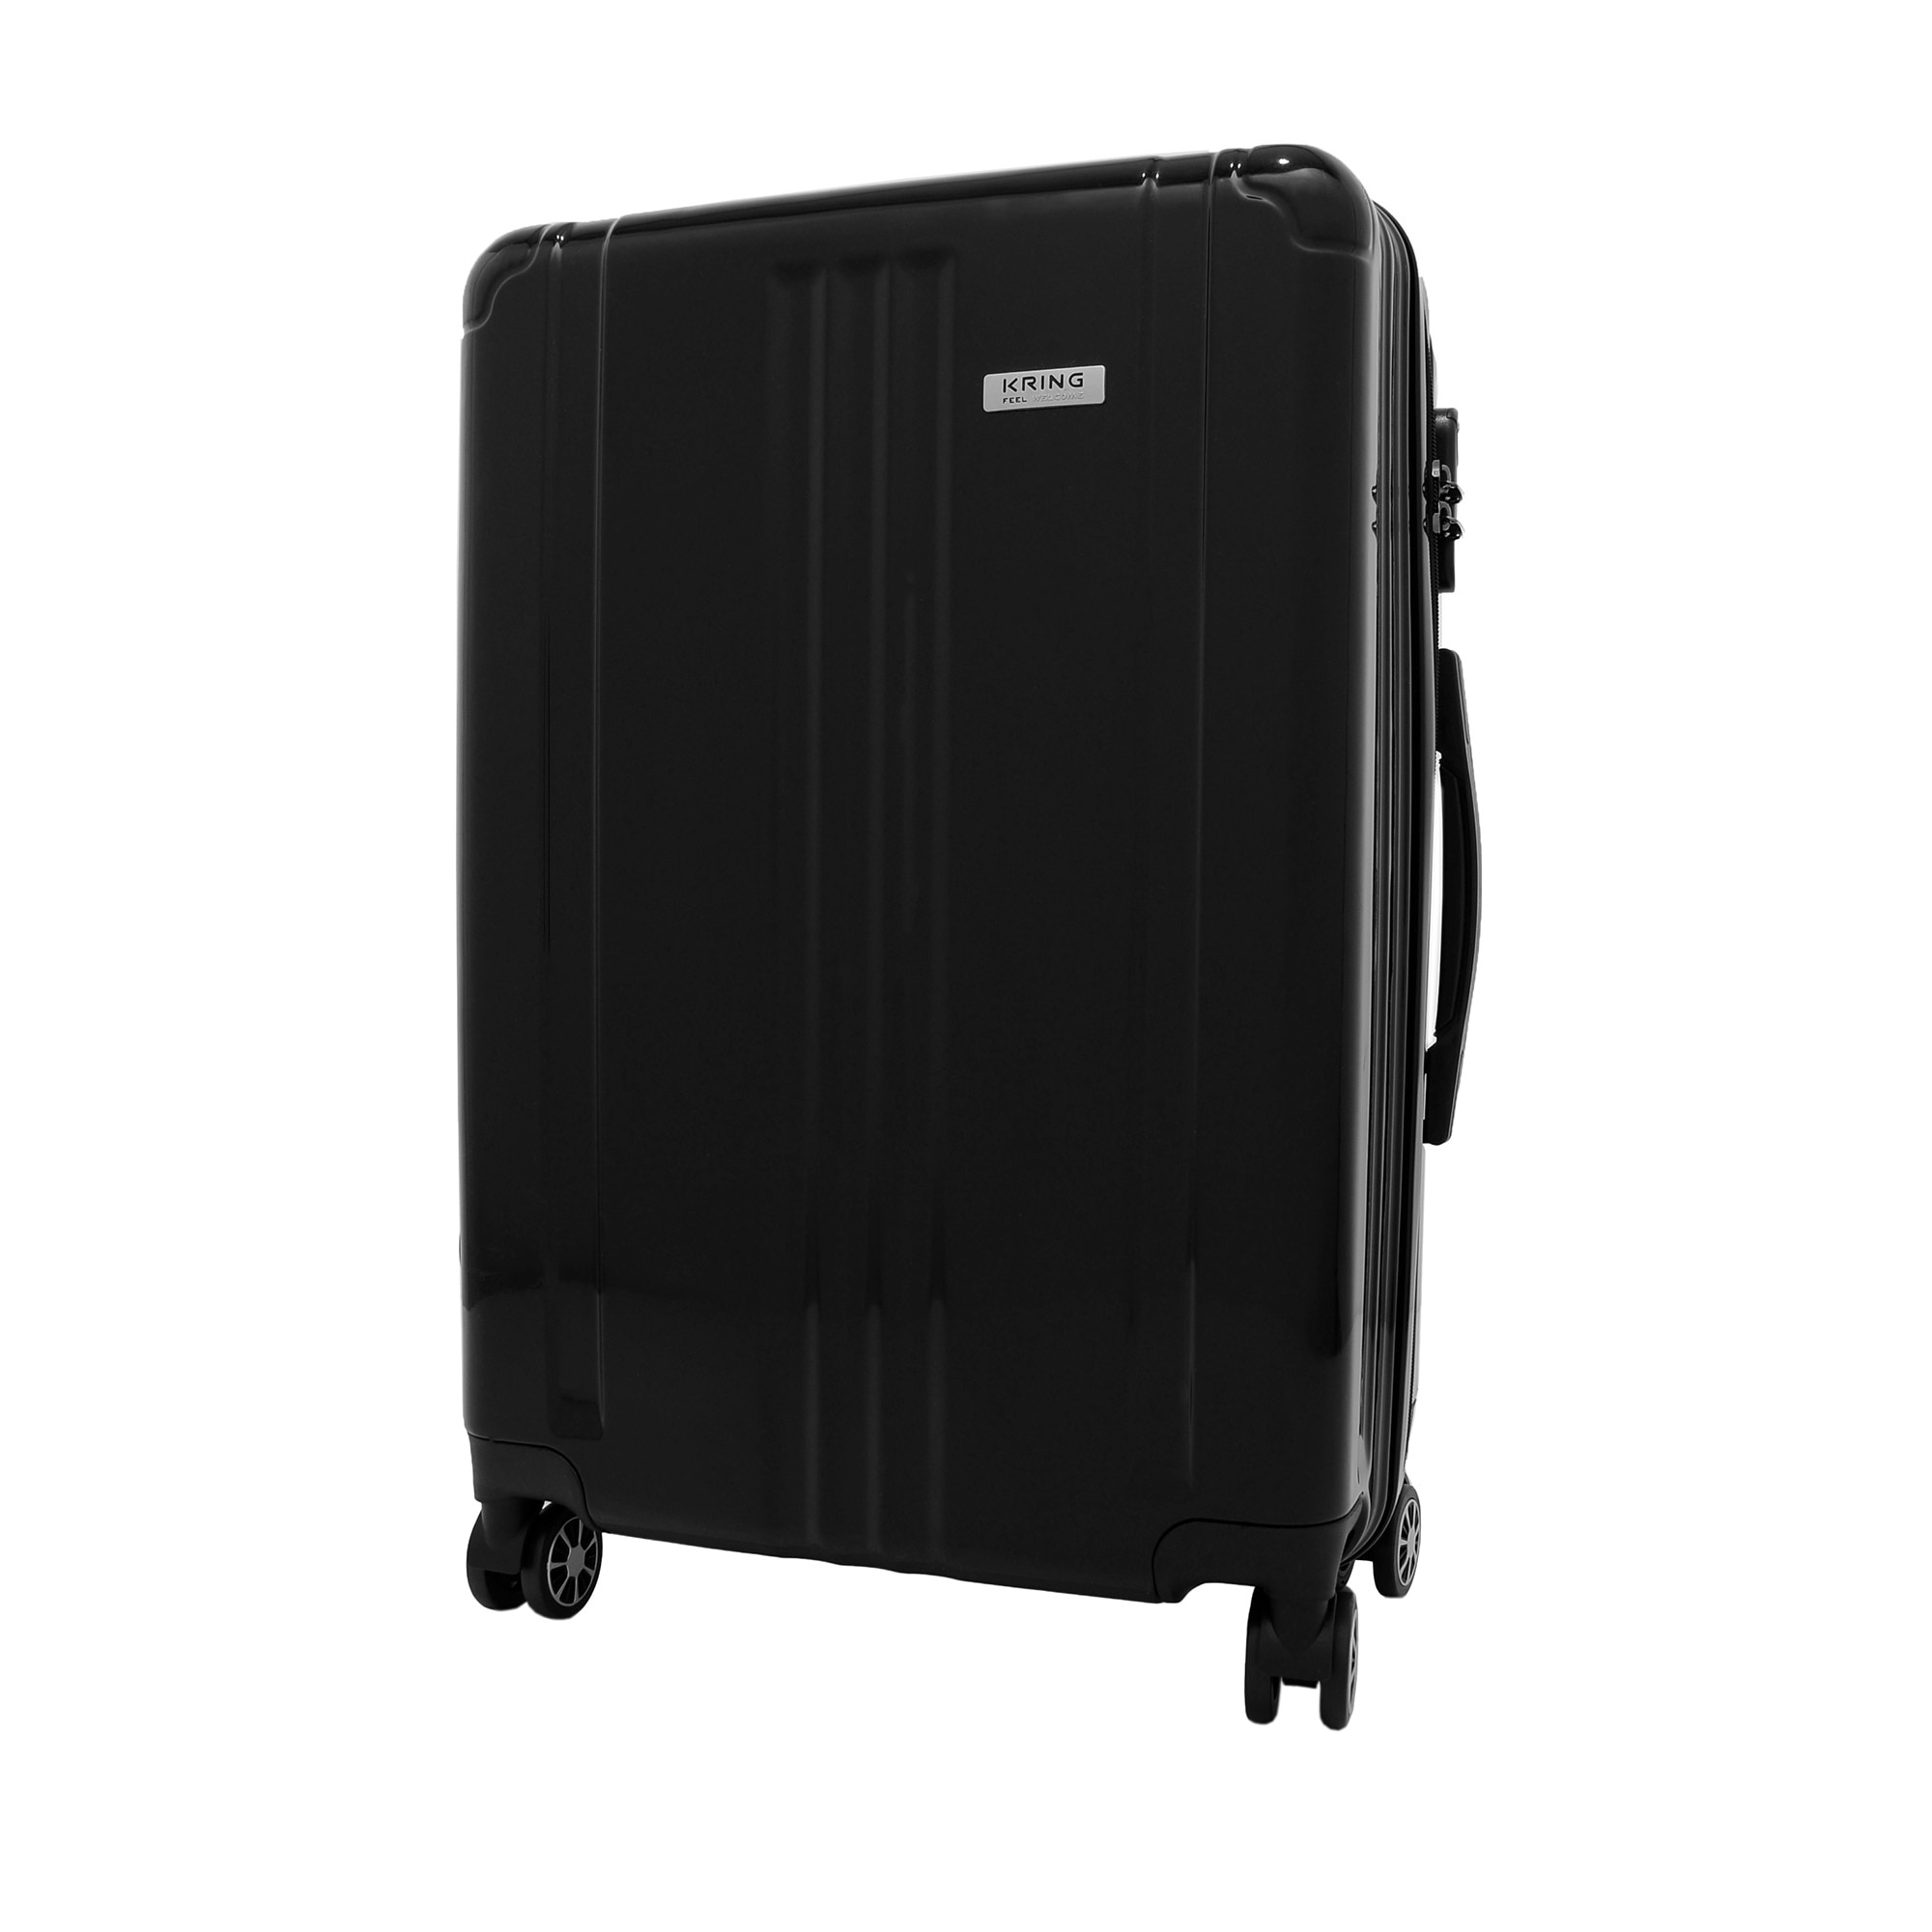 Fotografie Troler KRING Berlin ABS+PC, 75 cm, Black